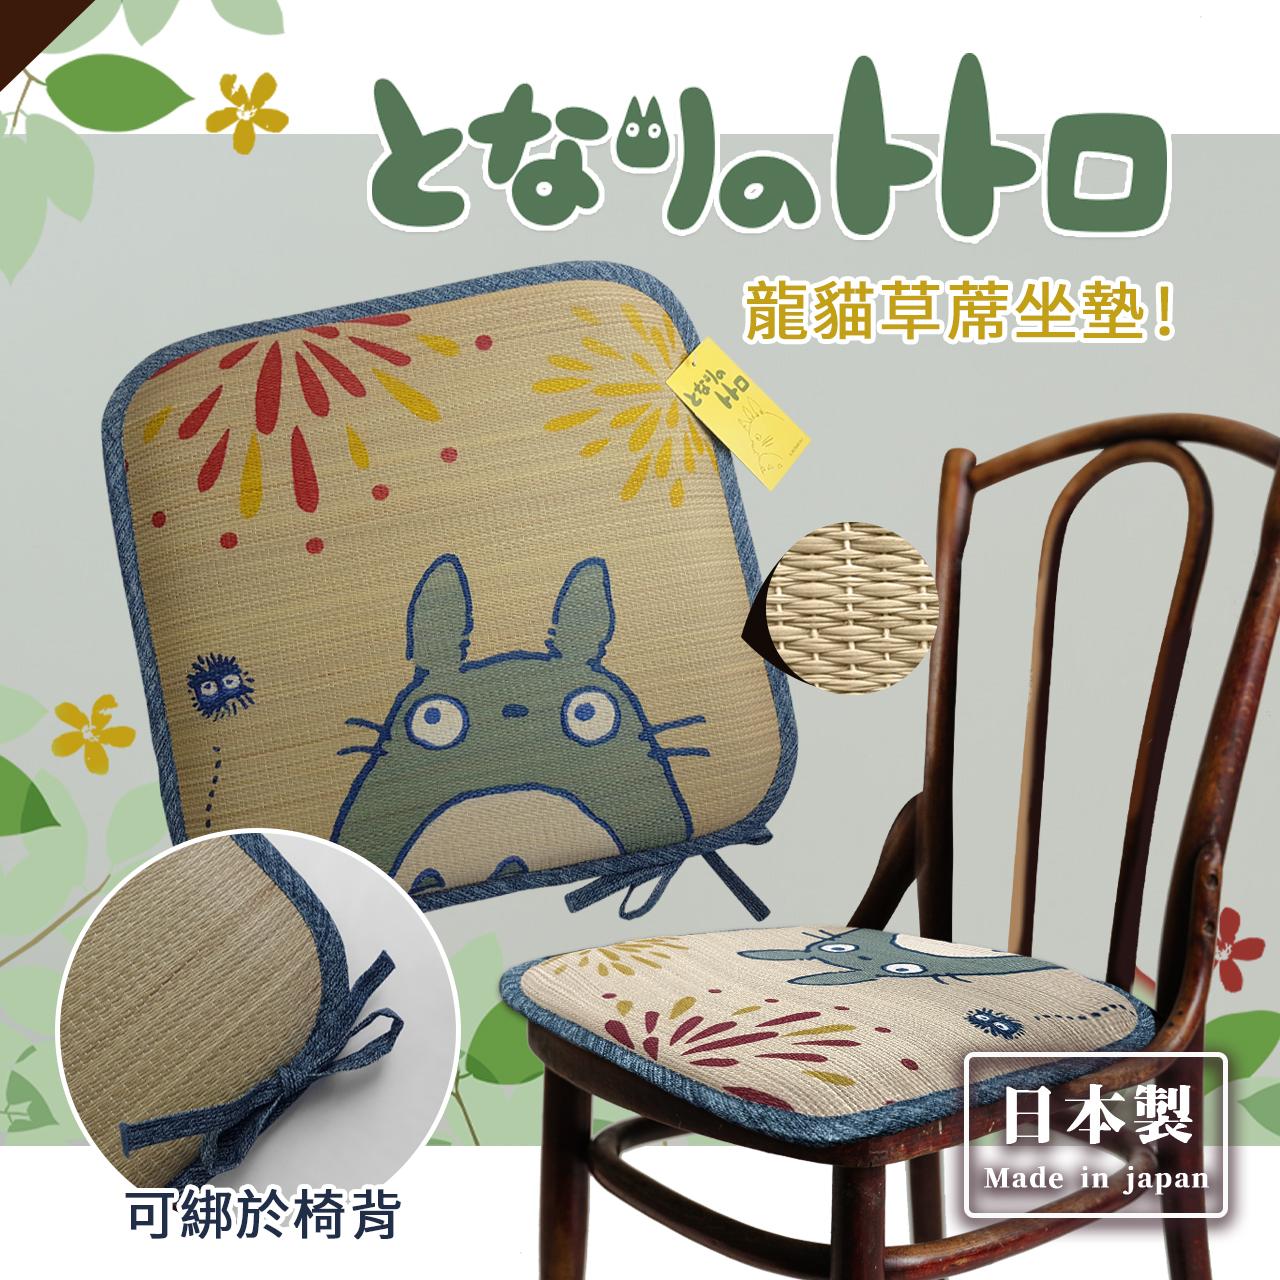 《HOYA-Life日本生活館》日本製 龍貓 傳統 草蓆  透氣 涼感 坐墊